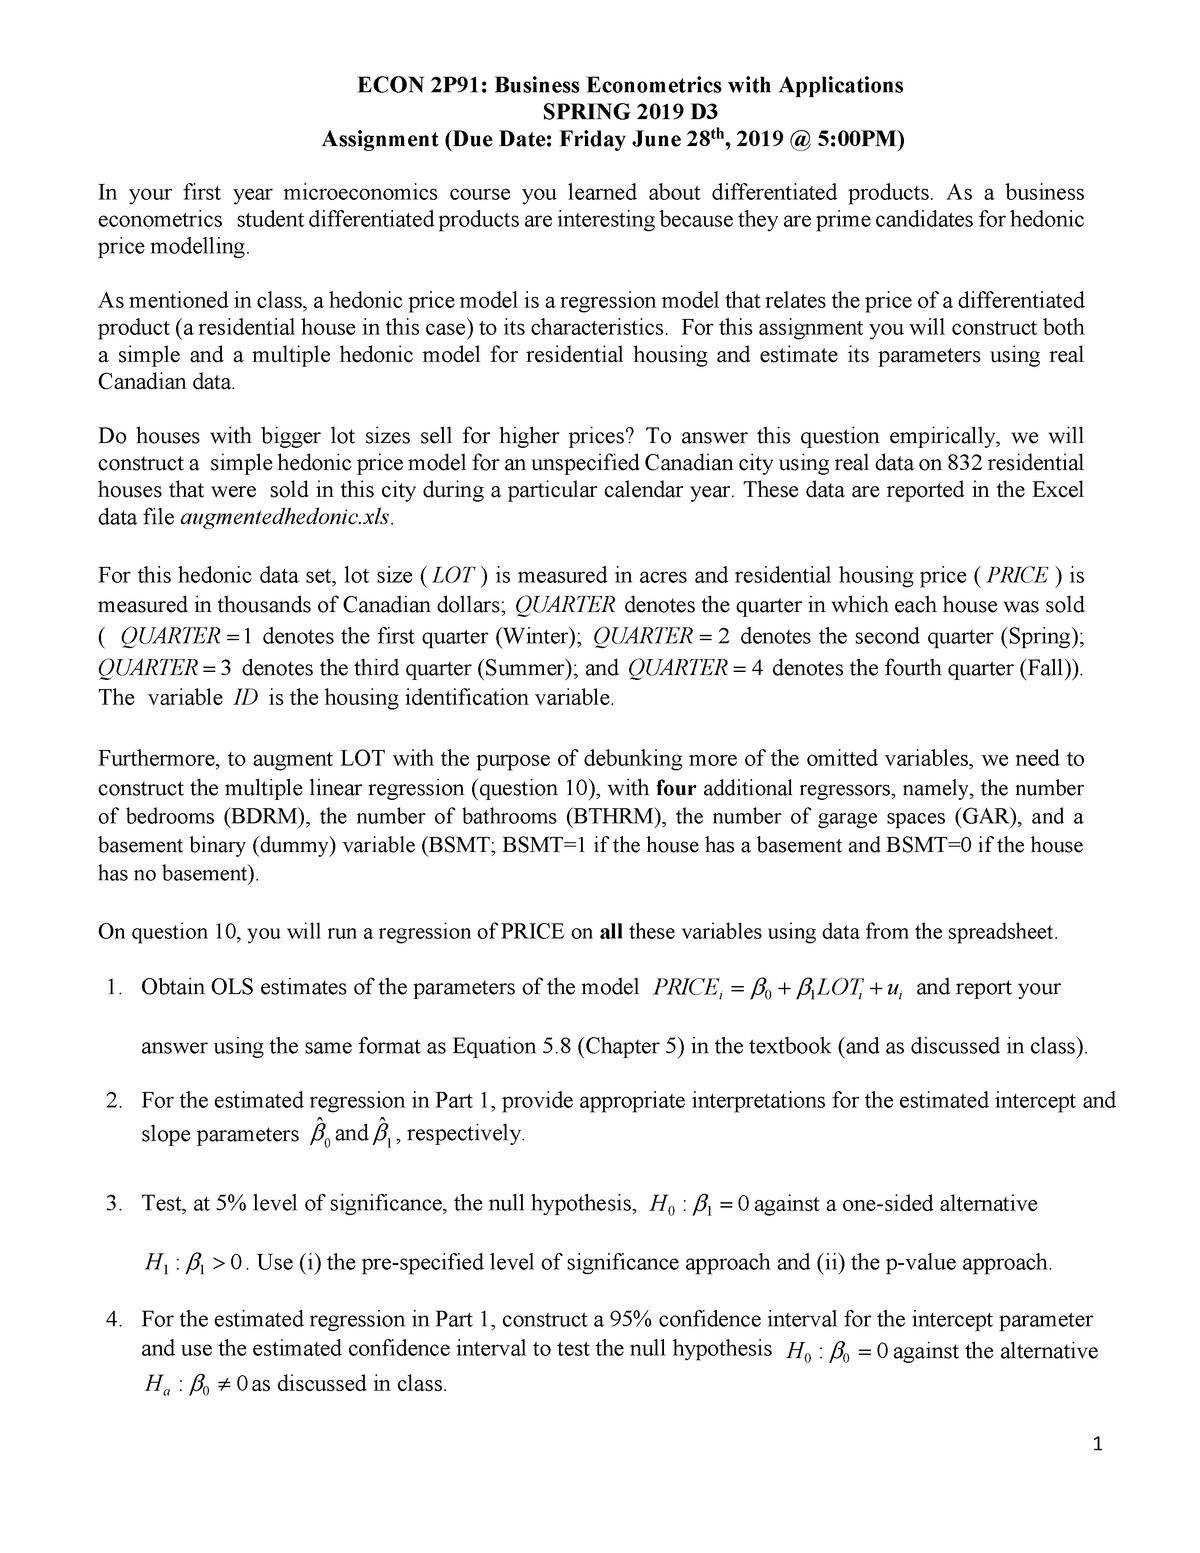 ECON2P91 SP19-Assignment - ECON 2P91: Business Econometrics with